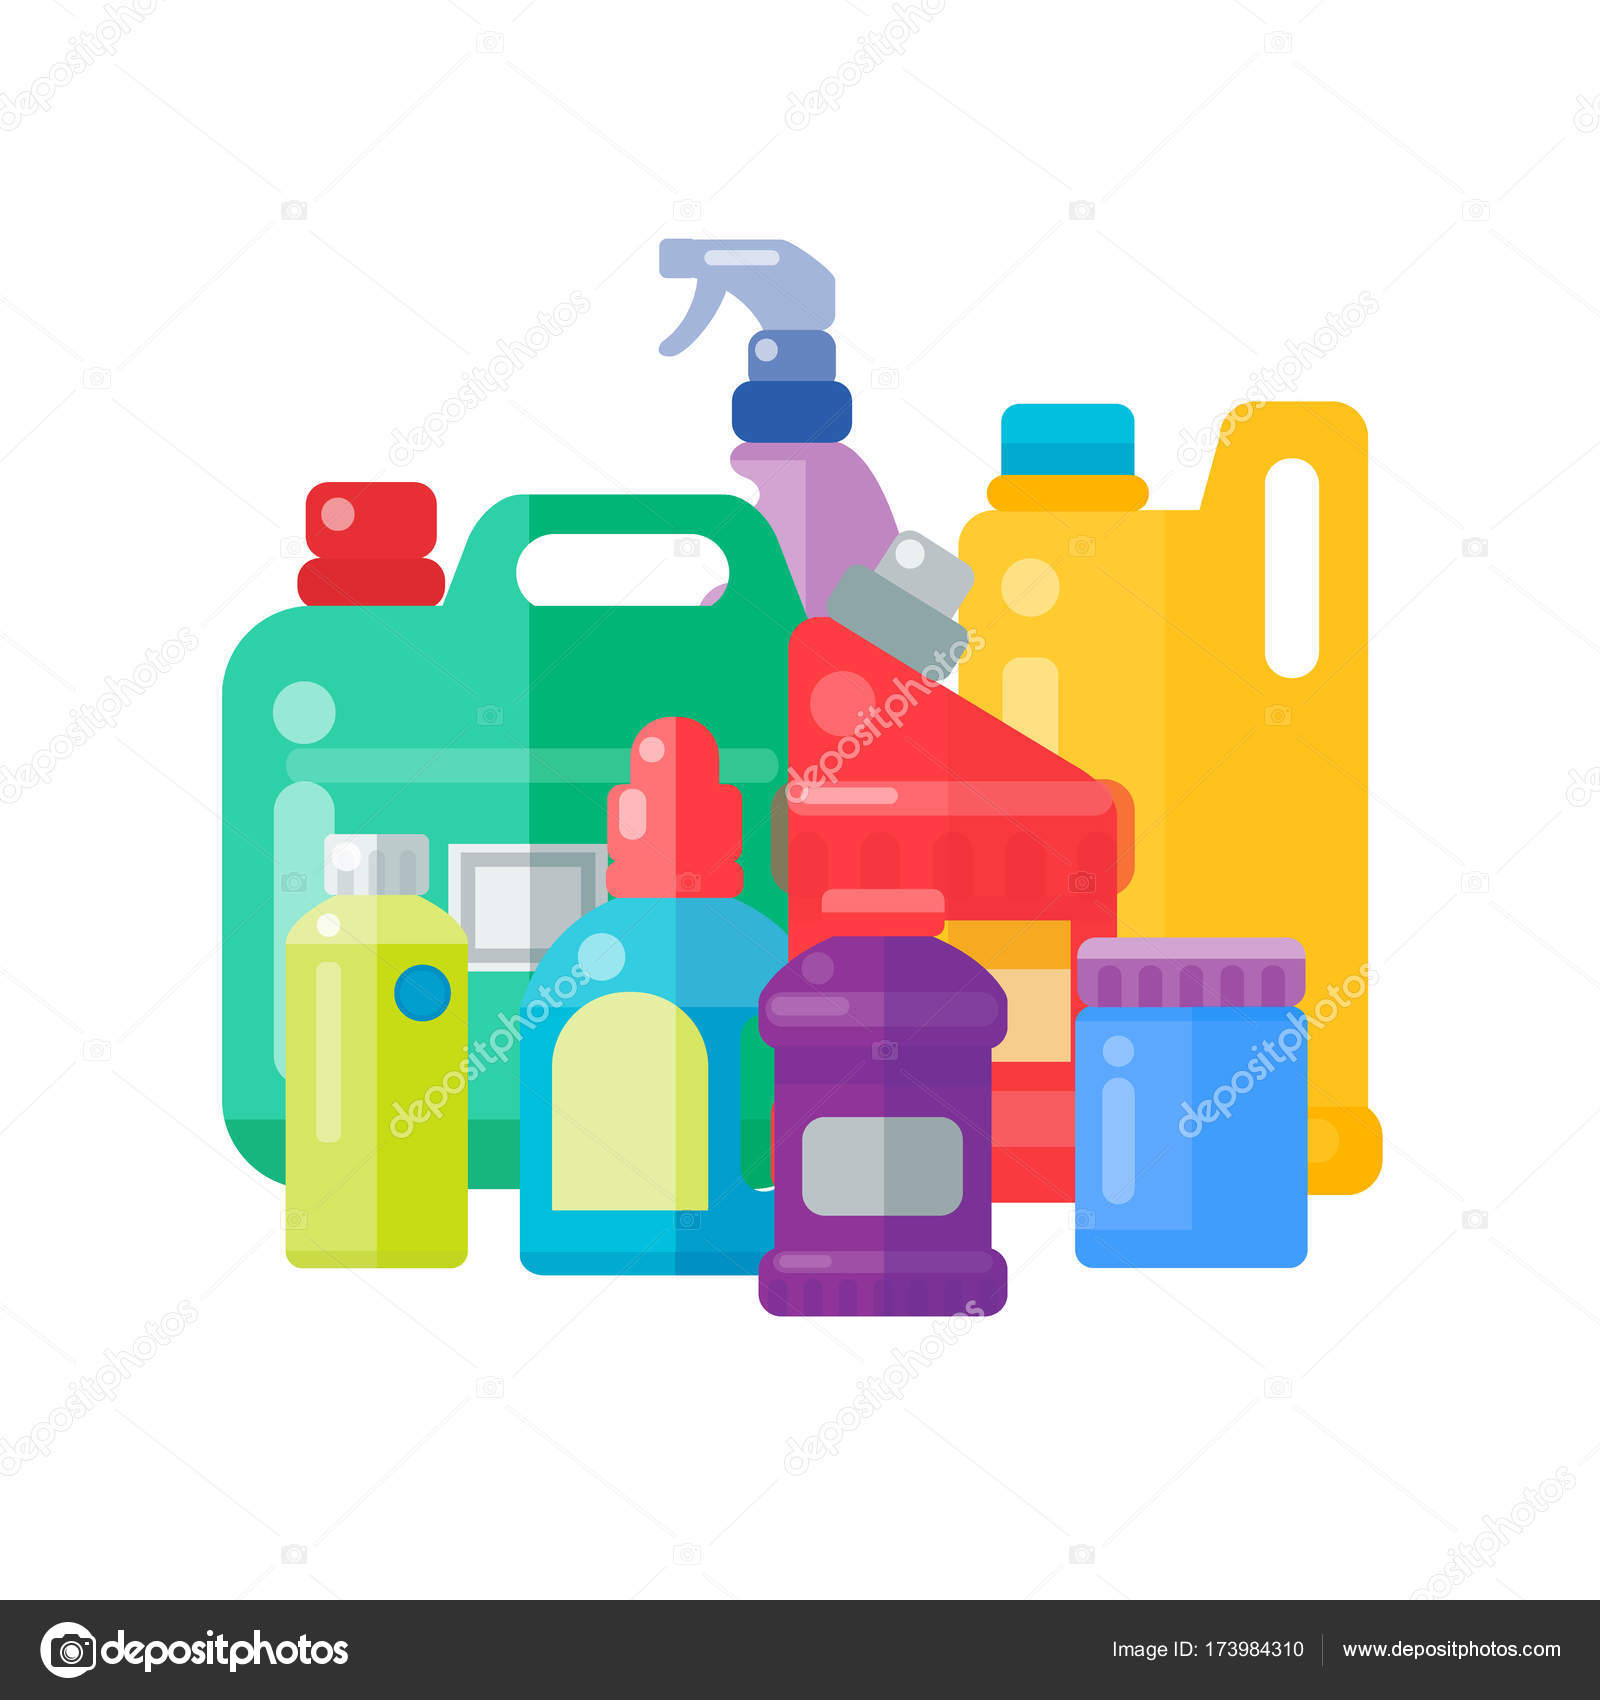 Waschmittel Clipart Remo Poletti Illustration